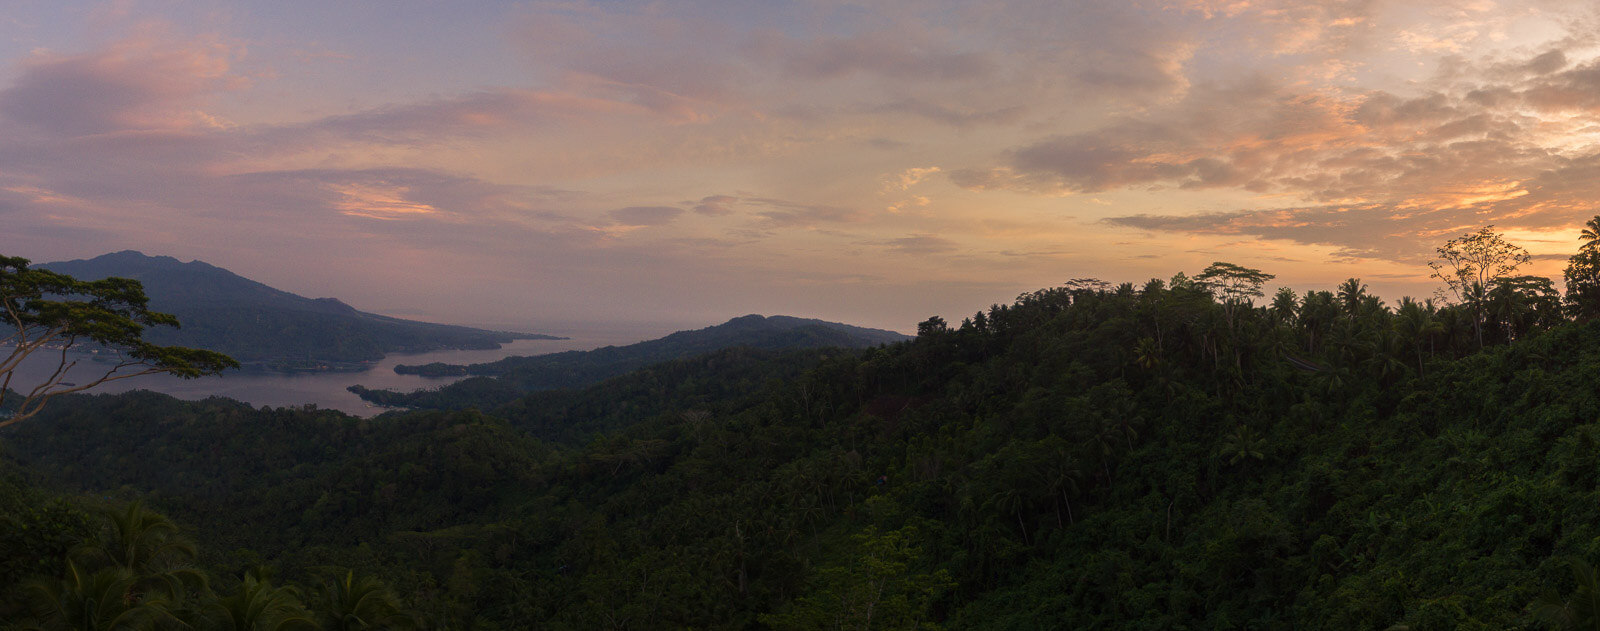 North Sulawesi Indonesia